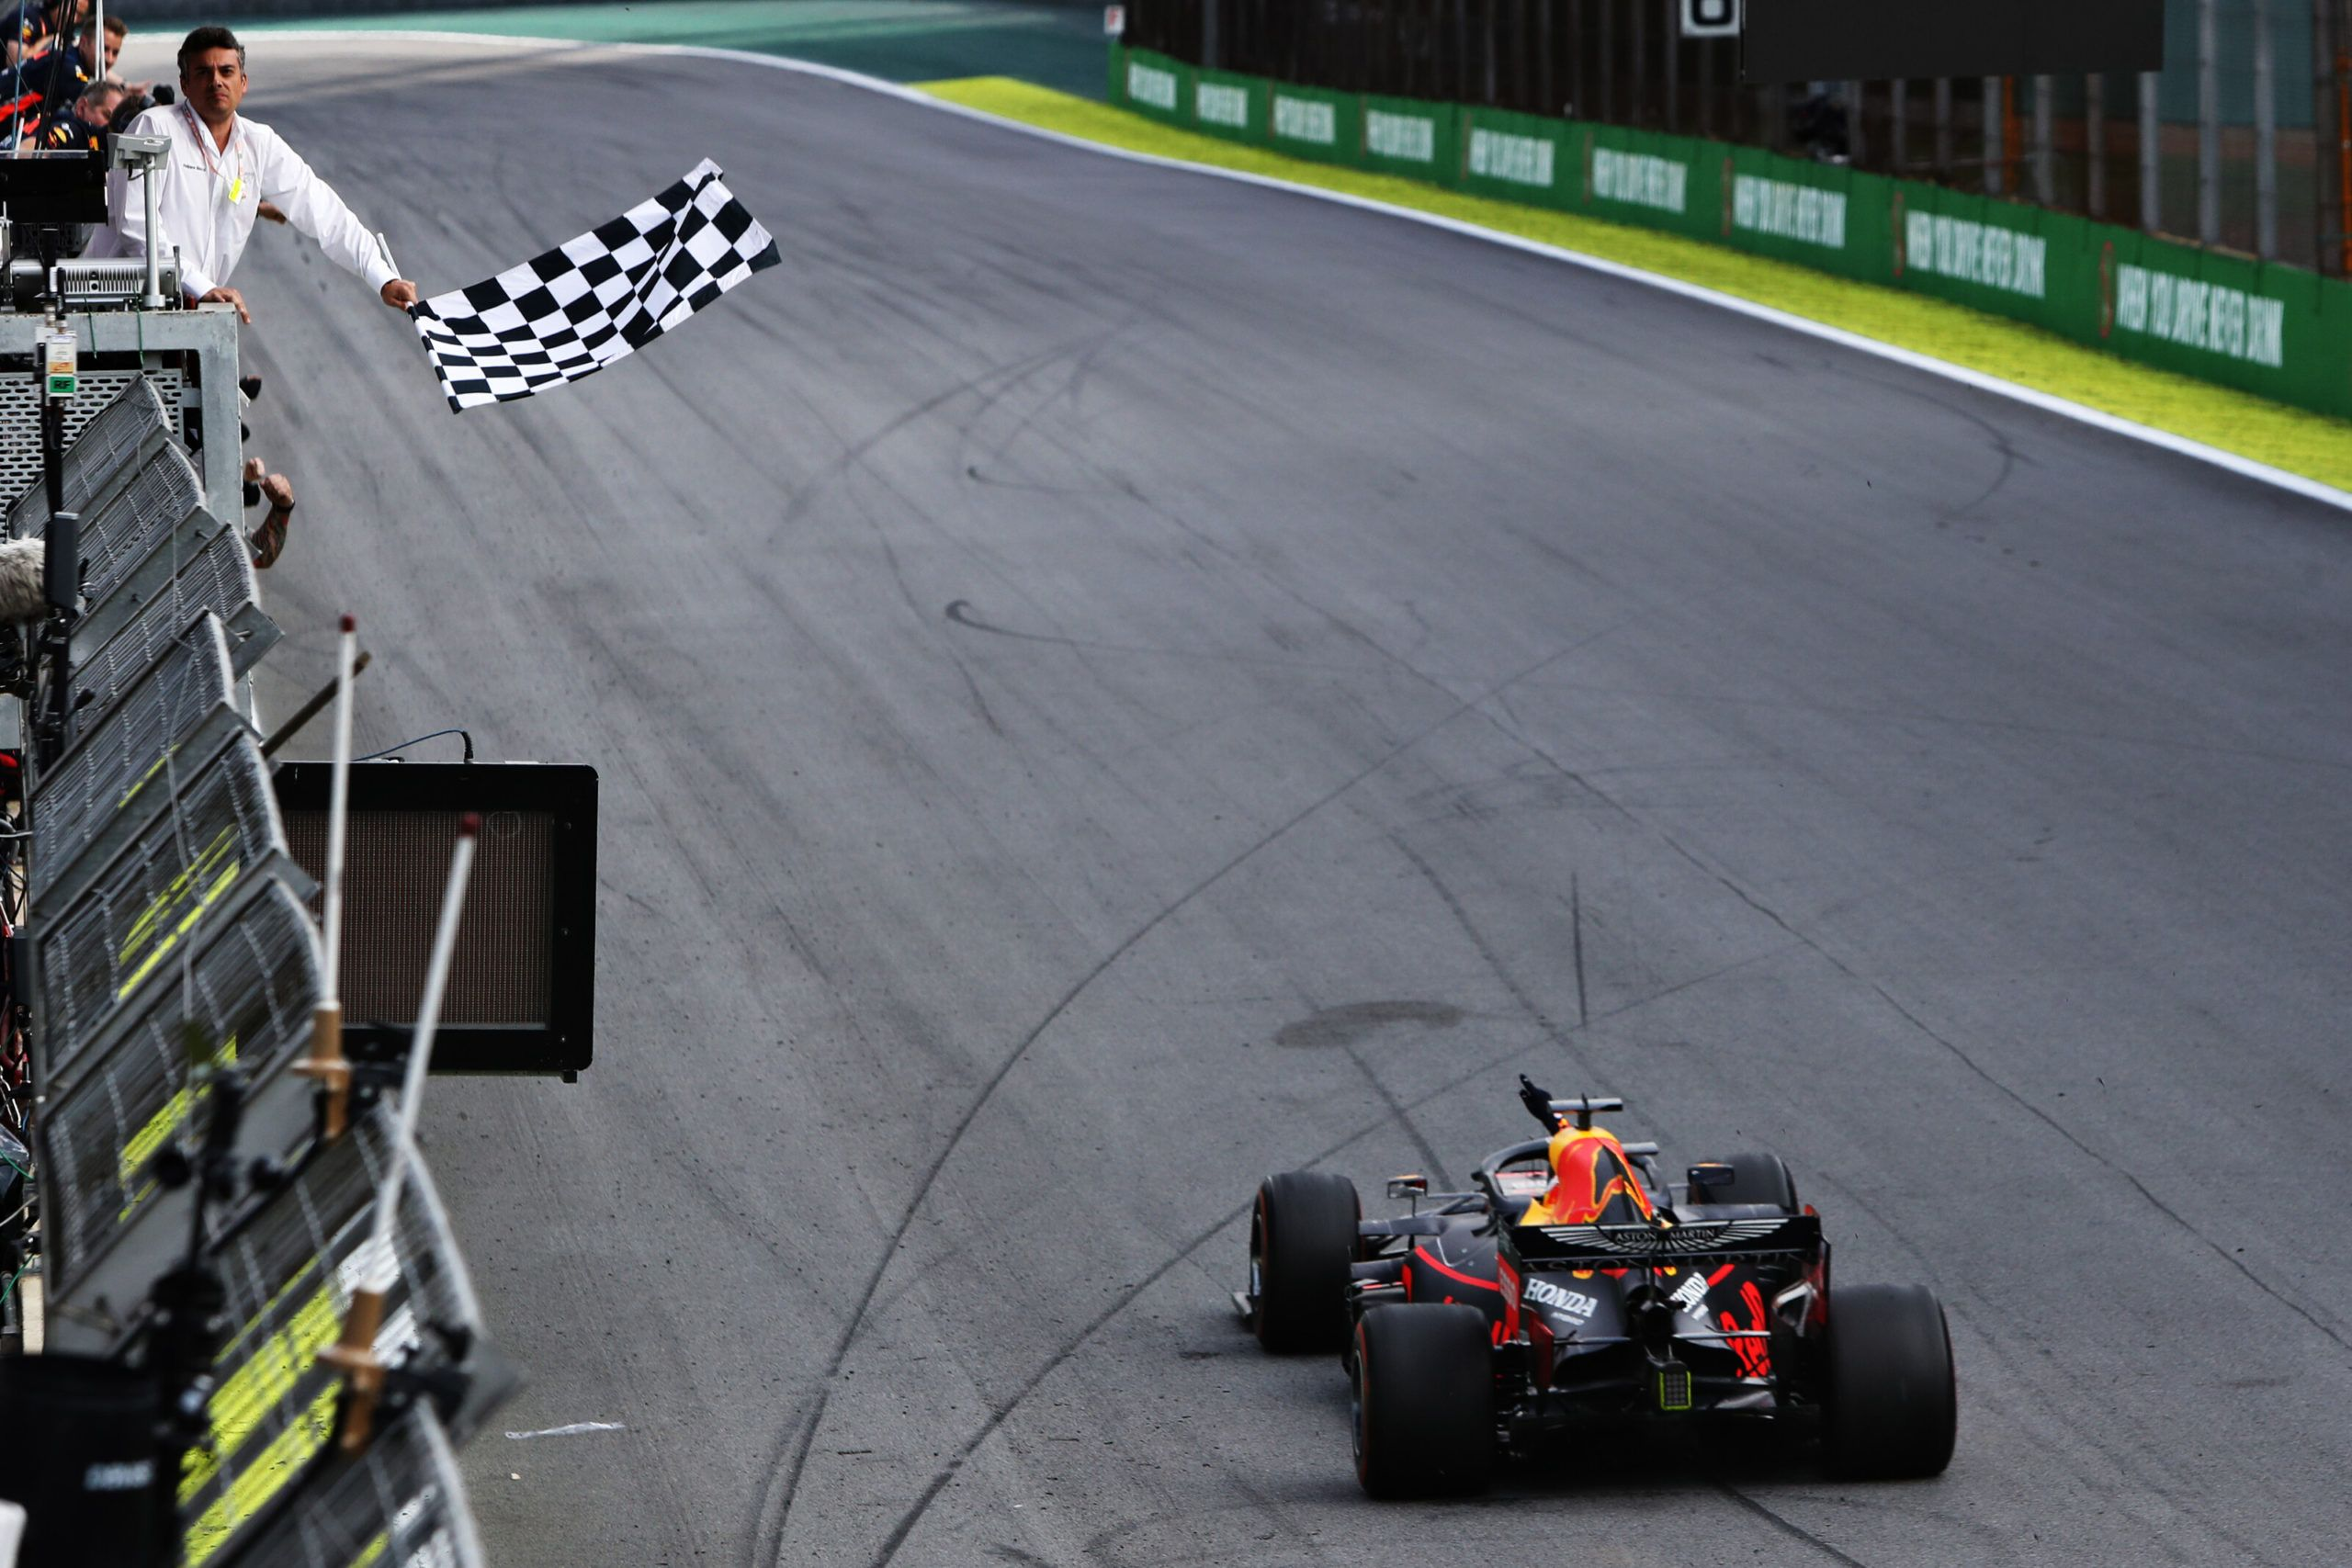 F1, FanCam, Canadian GP